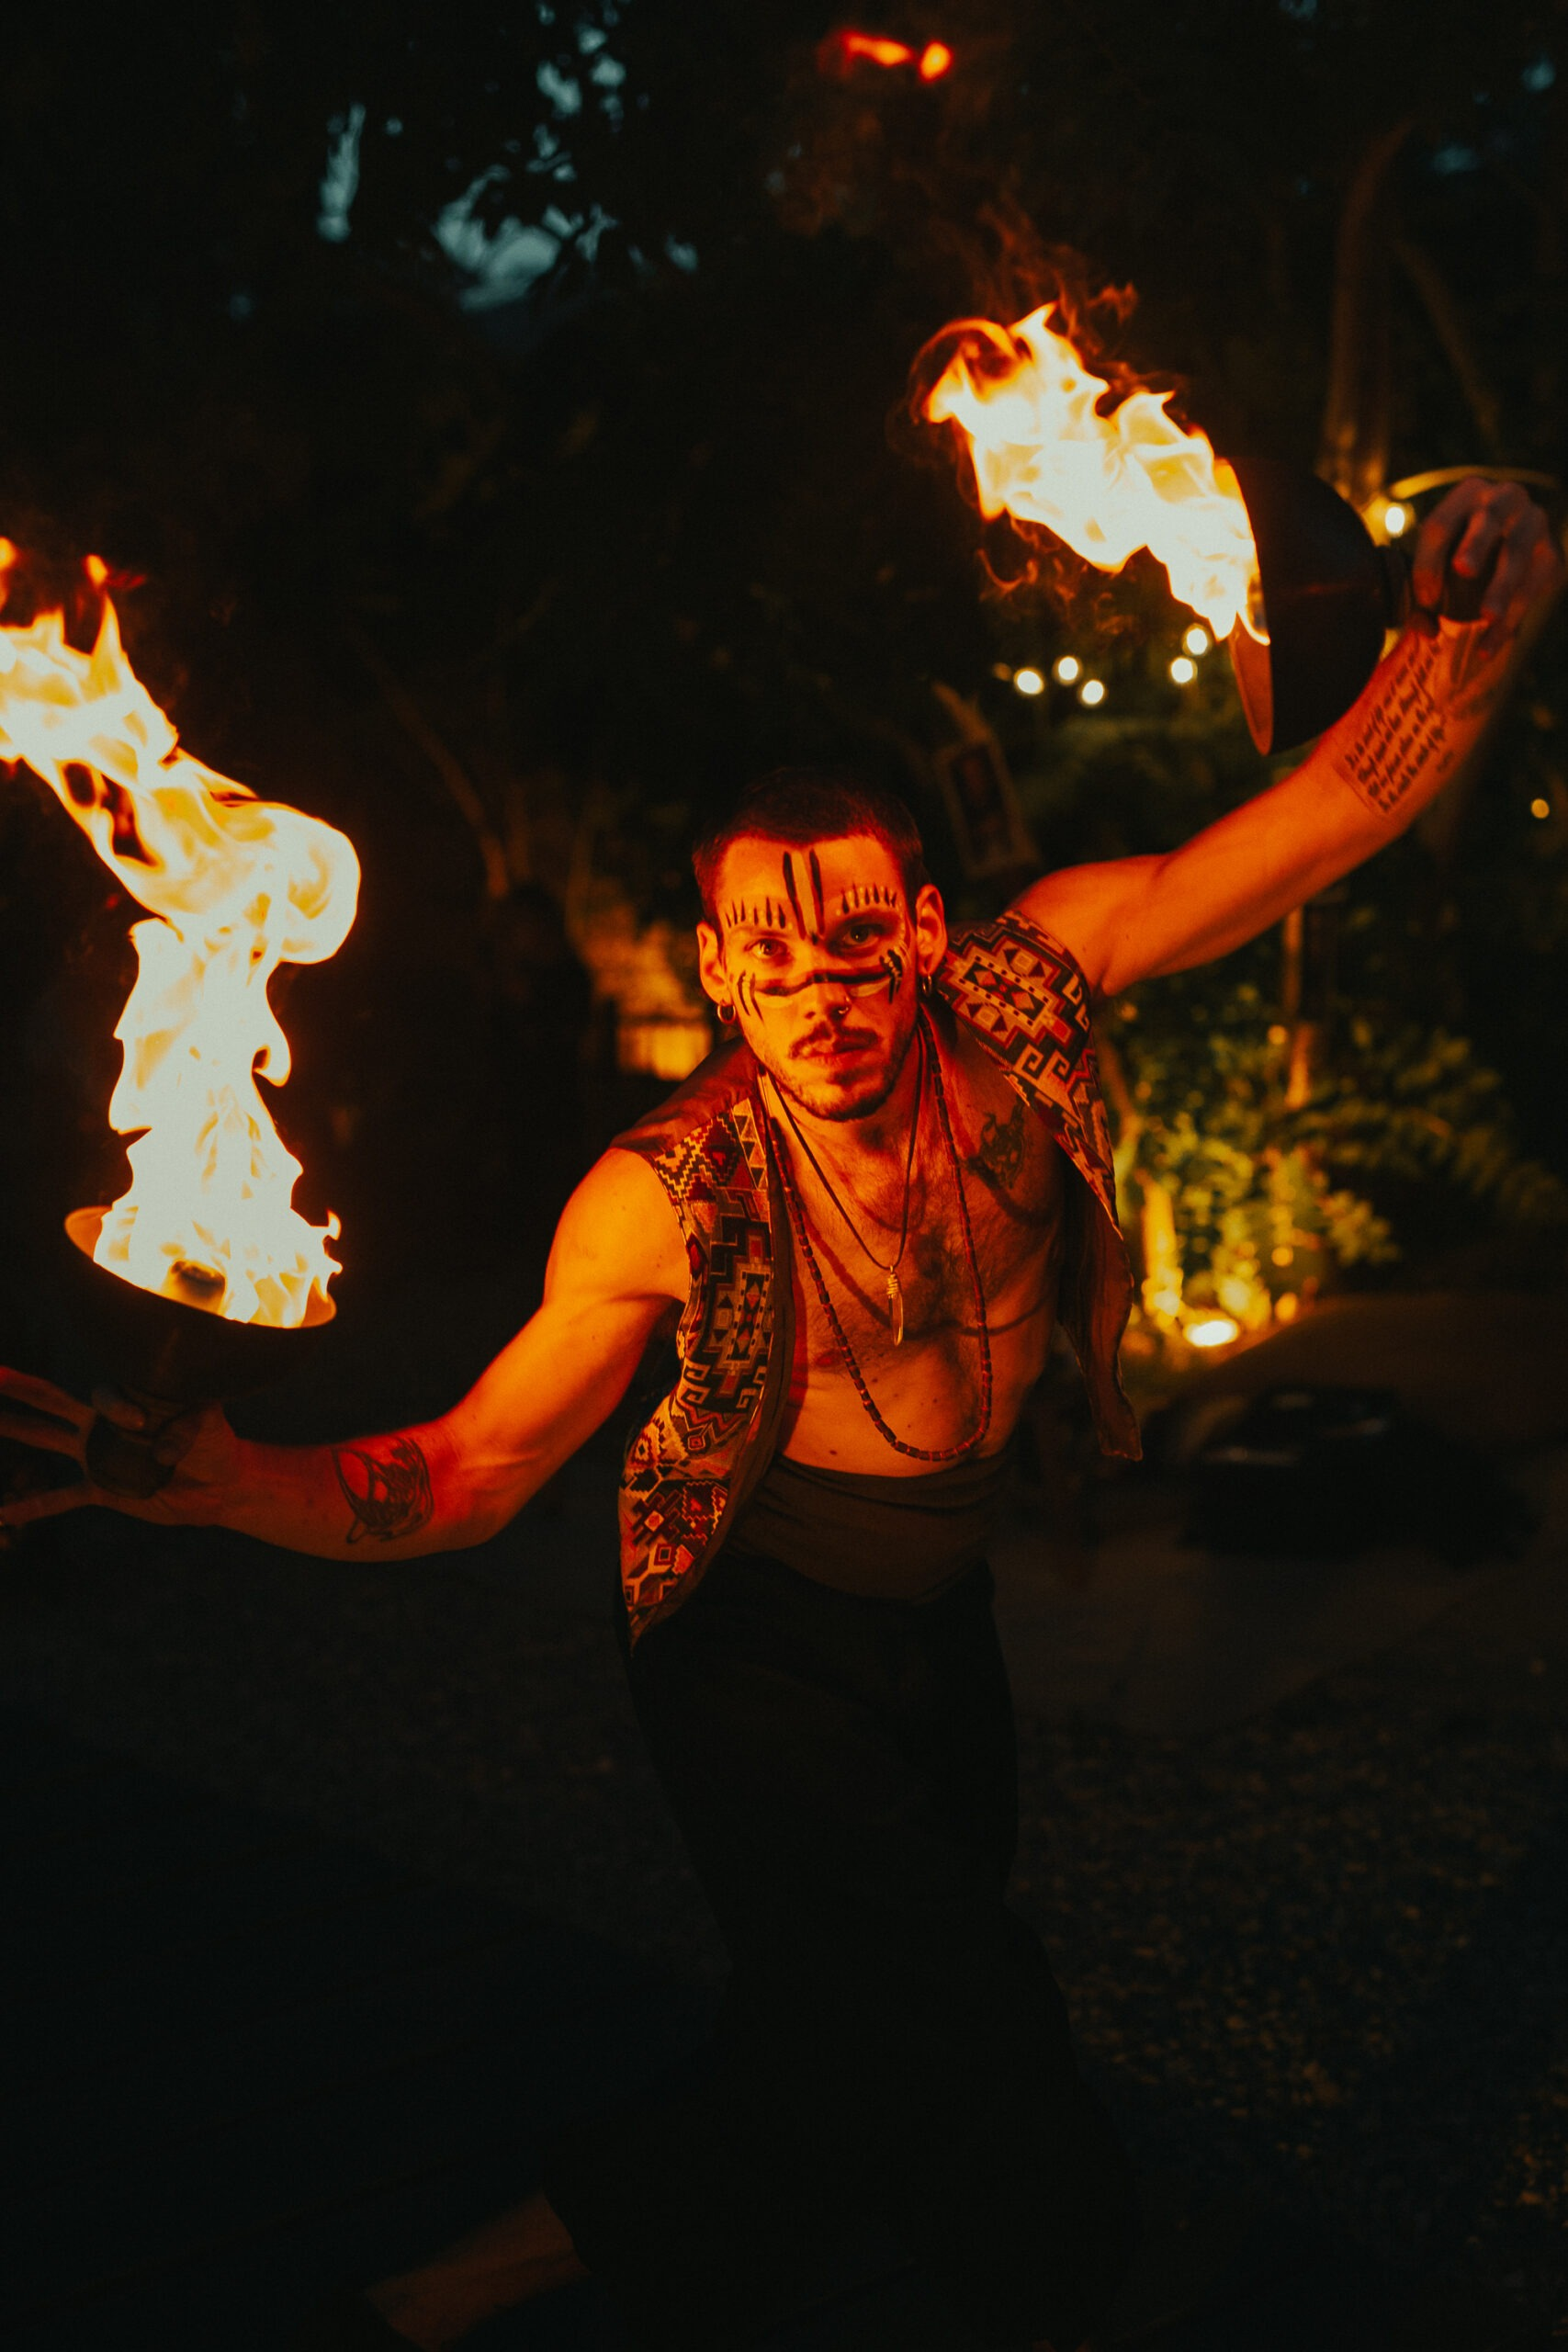 Nicola Colleoni Performarte – The Sanctuary Eco Reatreat Milano – fire perfomer – dancer – performance